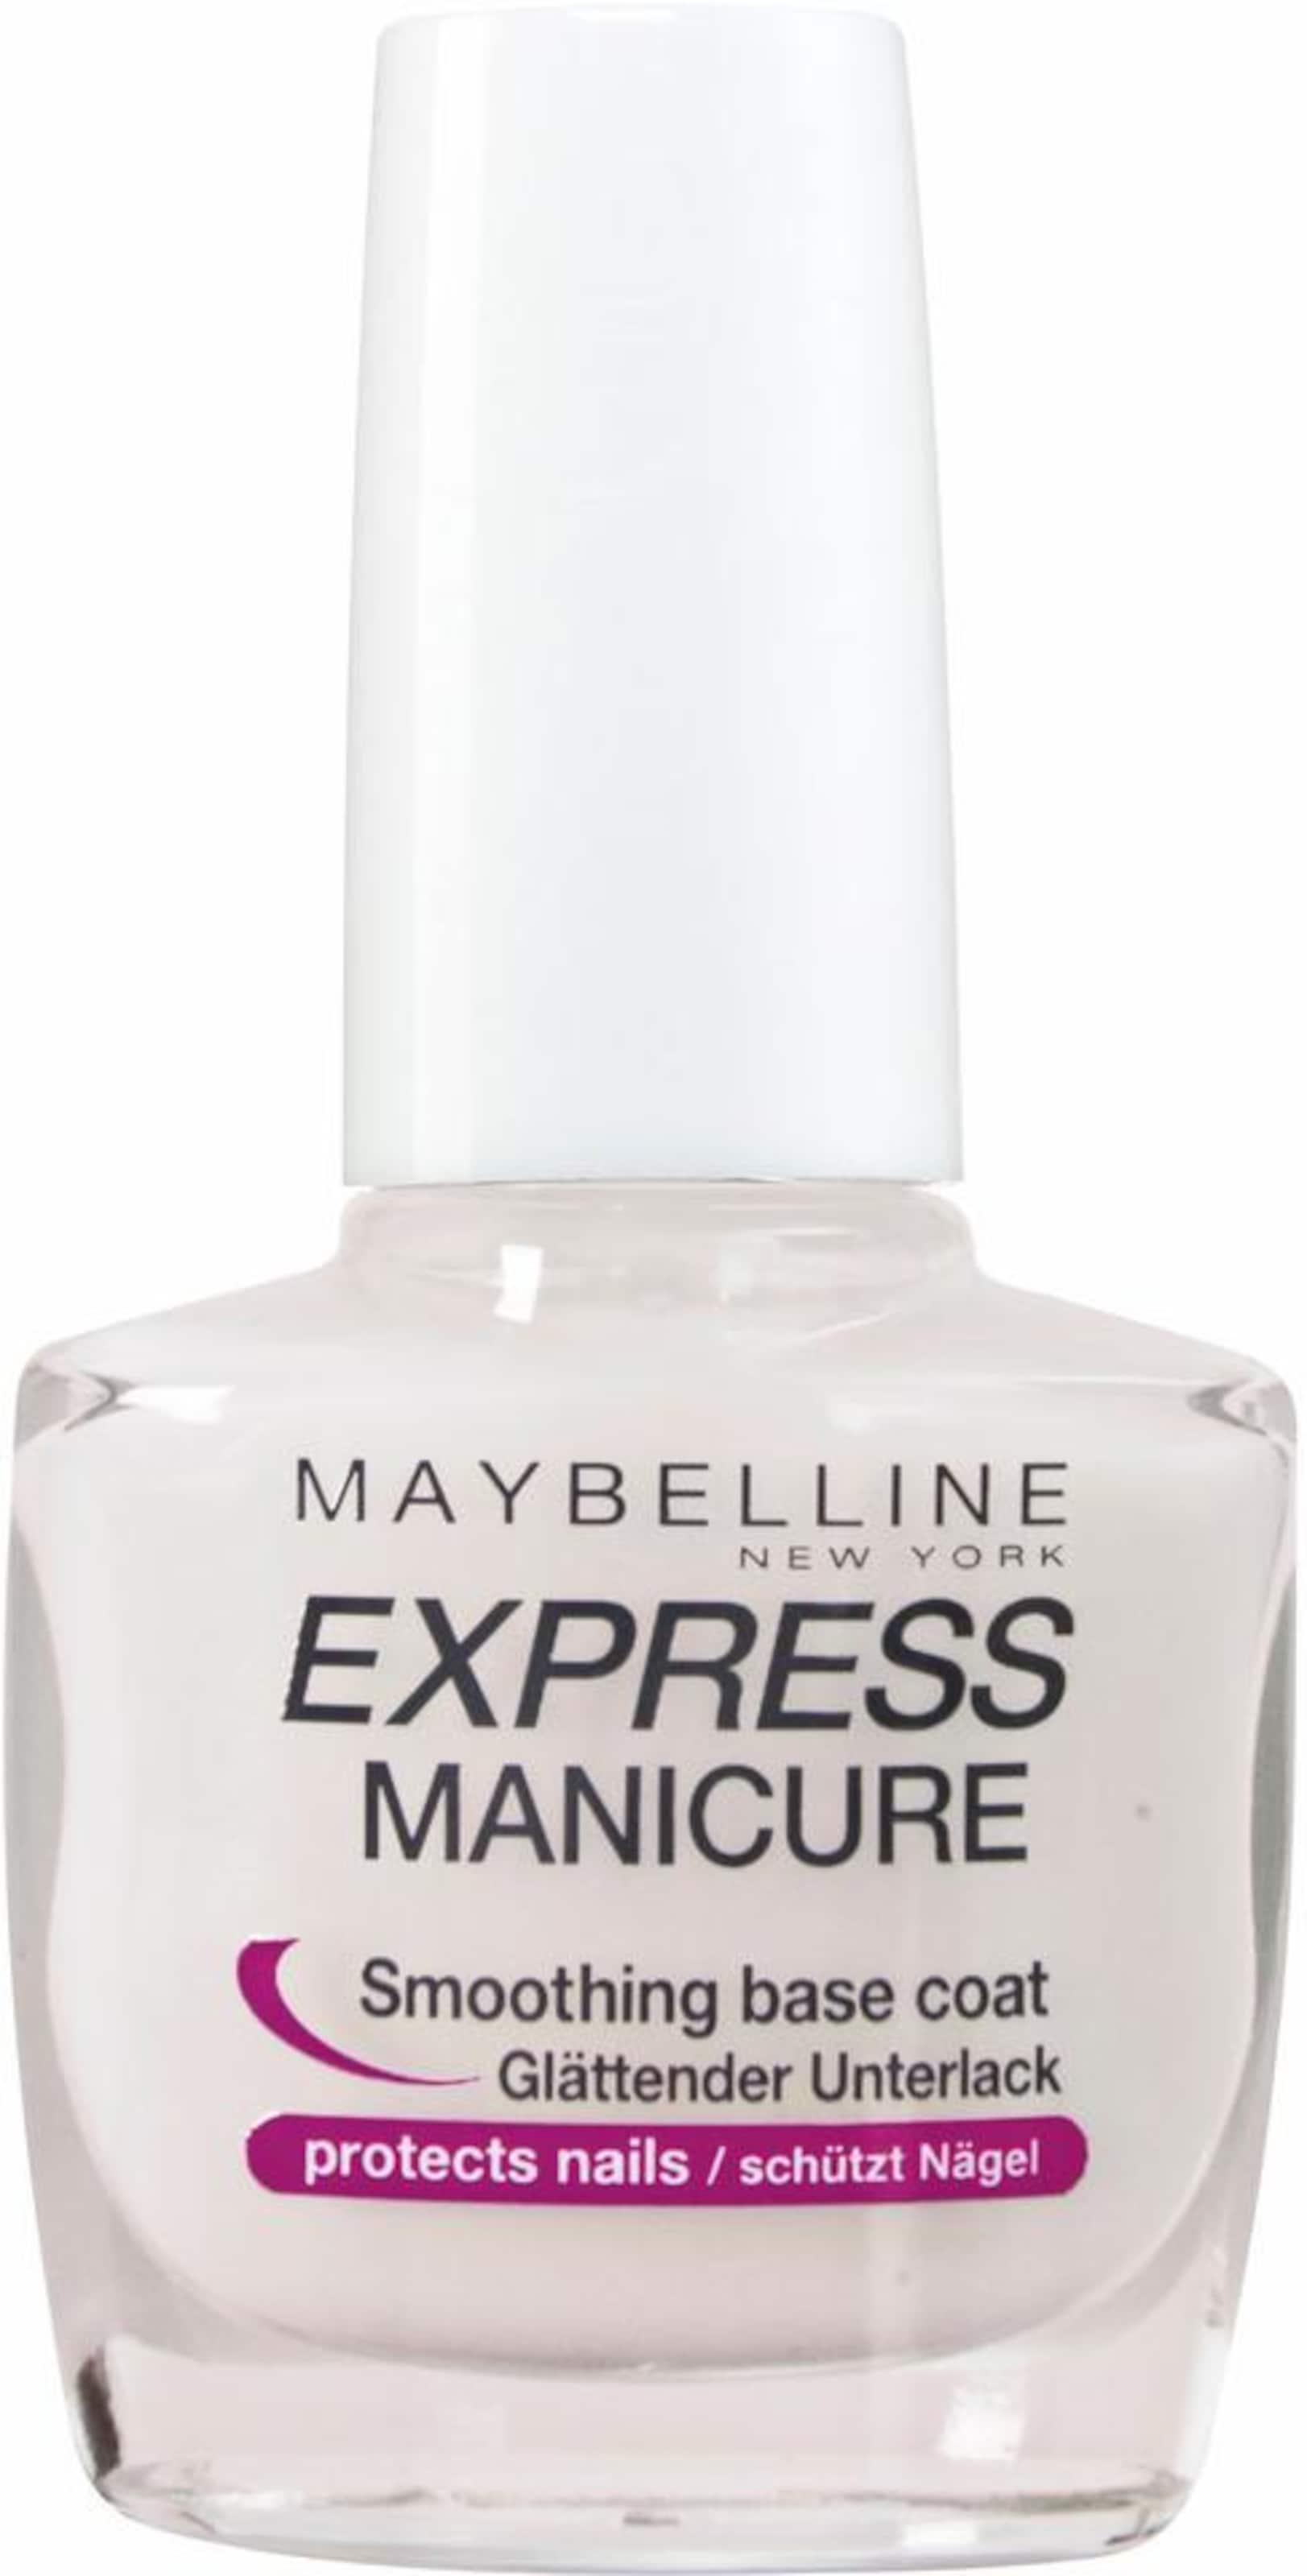 MAYBELLINE New York 'Express Manicure Unterlack', Nagelpflege